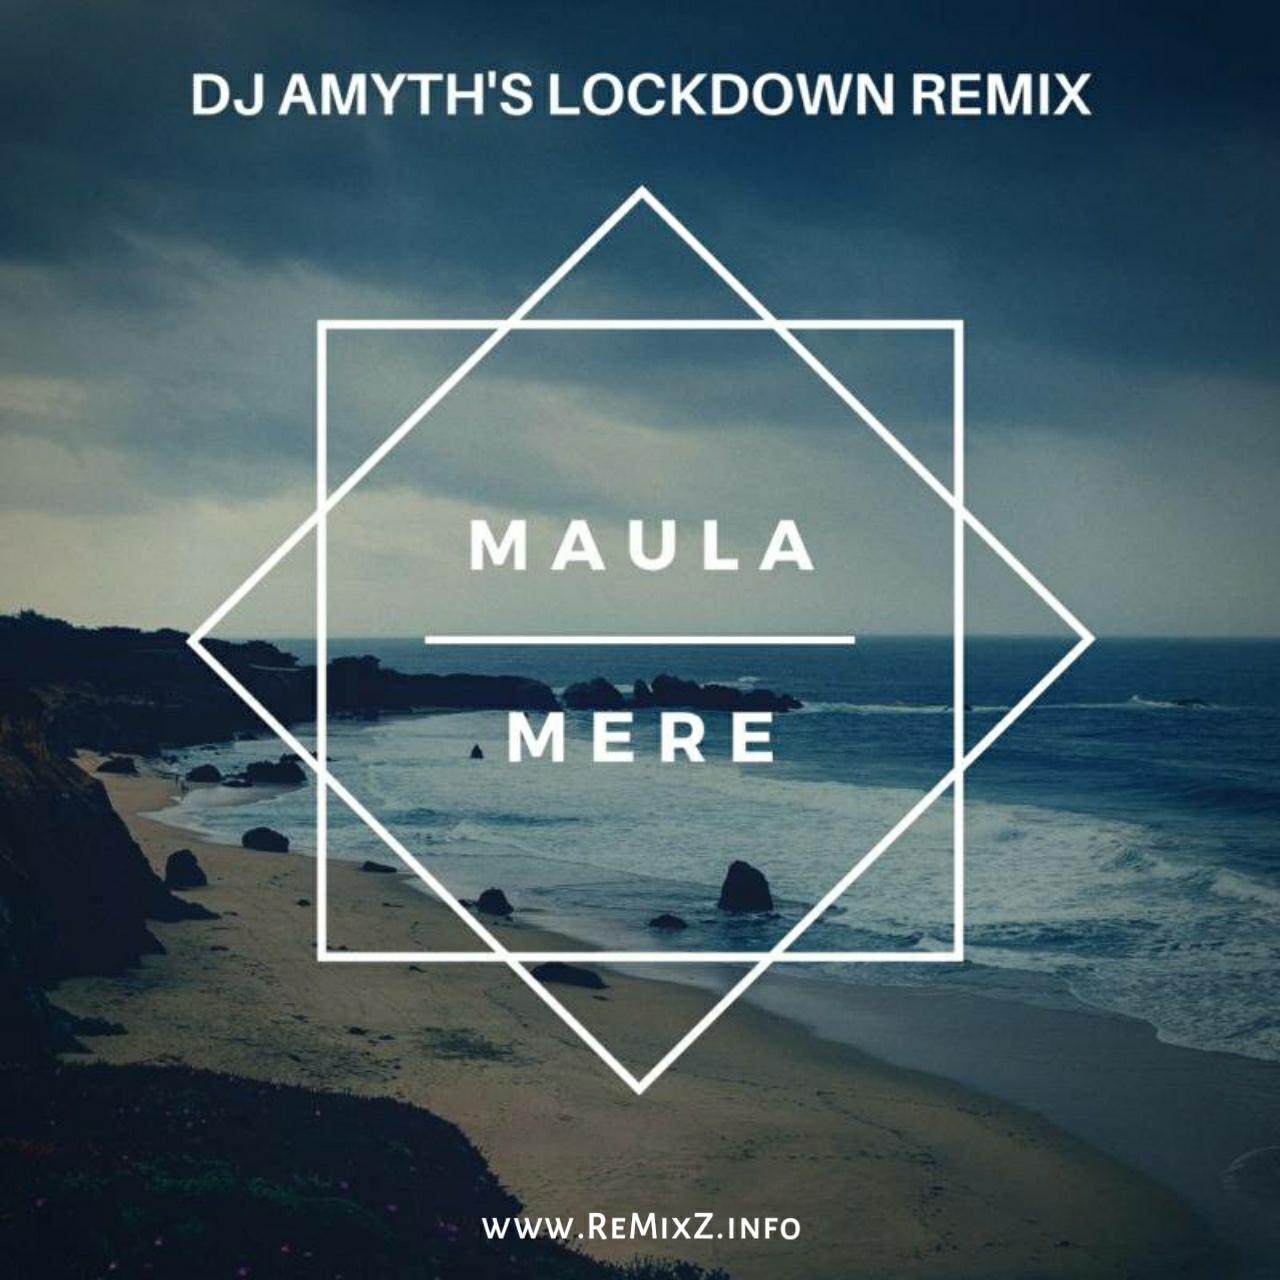 Maula Mere - DJ Amyths Lockdown Remix